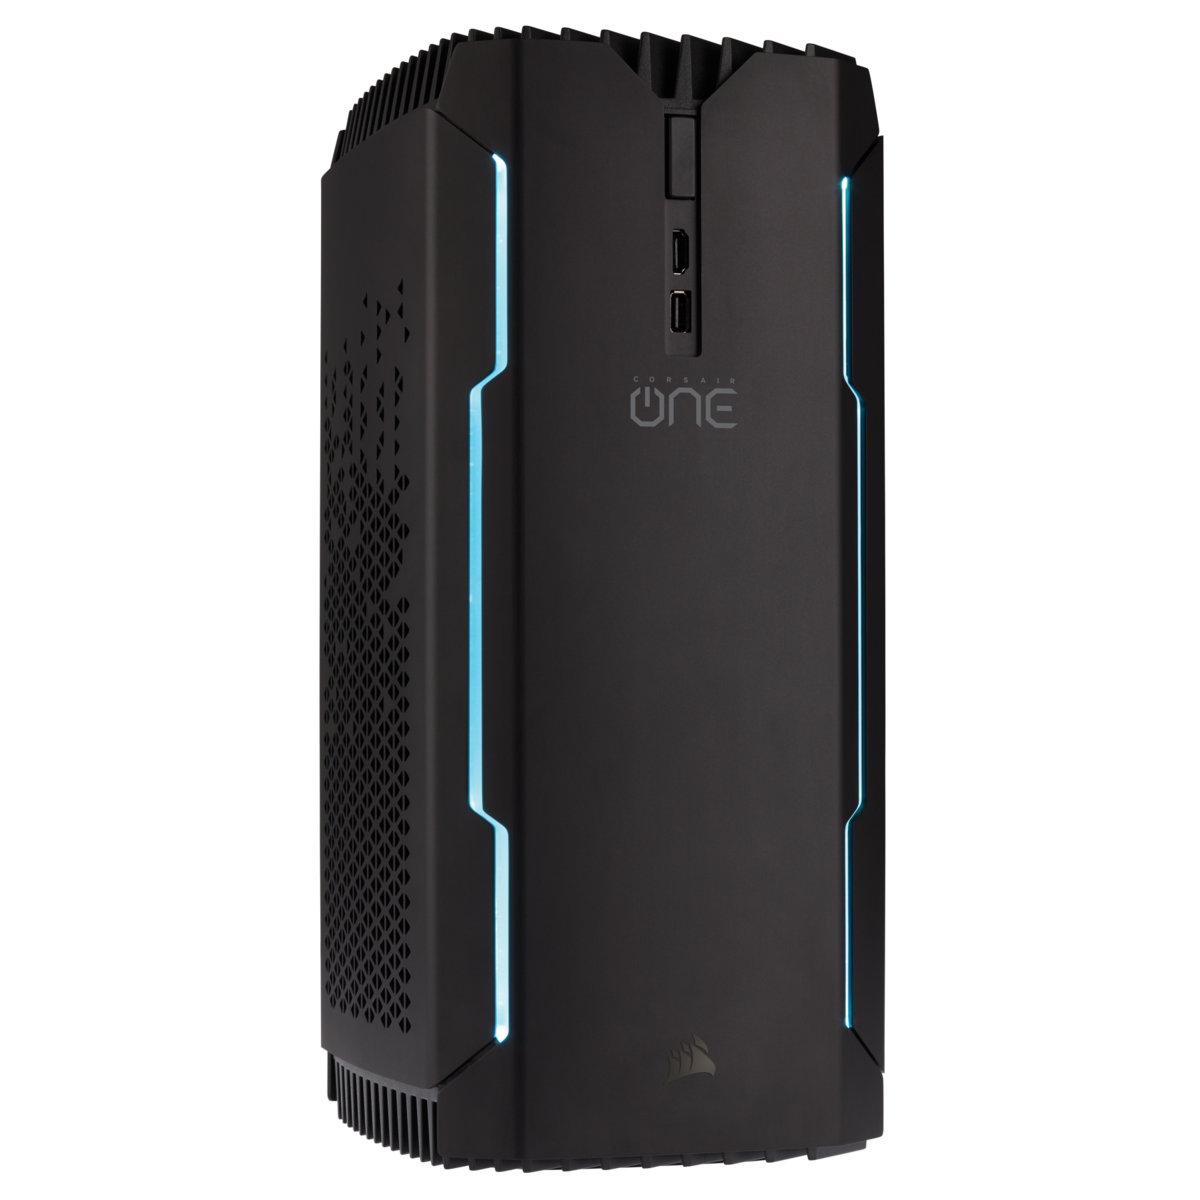 CORSAIR ONE Compact Gaming PC I7-7700, NVIDIA® GeForce GTX 1070, 16GB DDR4-2400, 240GB SSD, 1TB HDD (Refurbished) $1,099.00 $1099